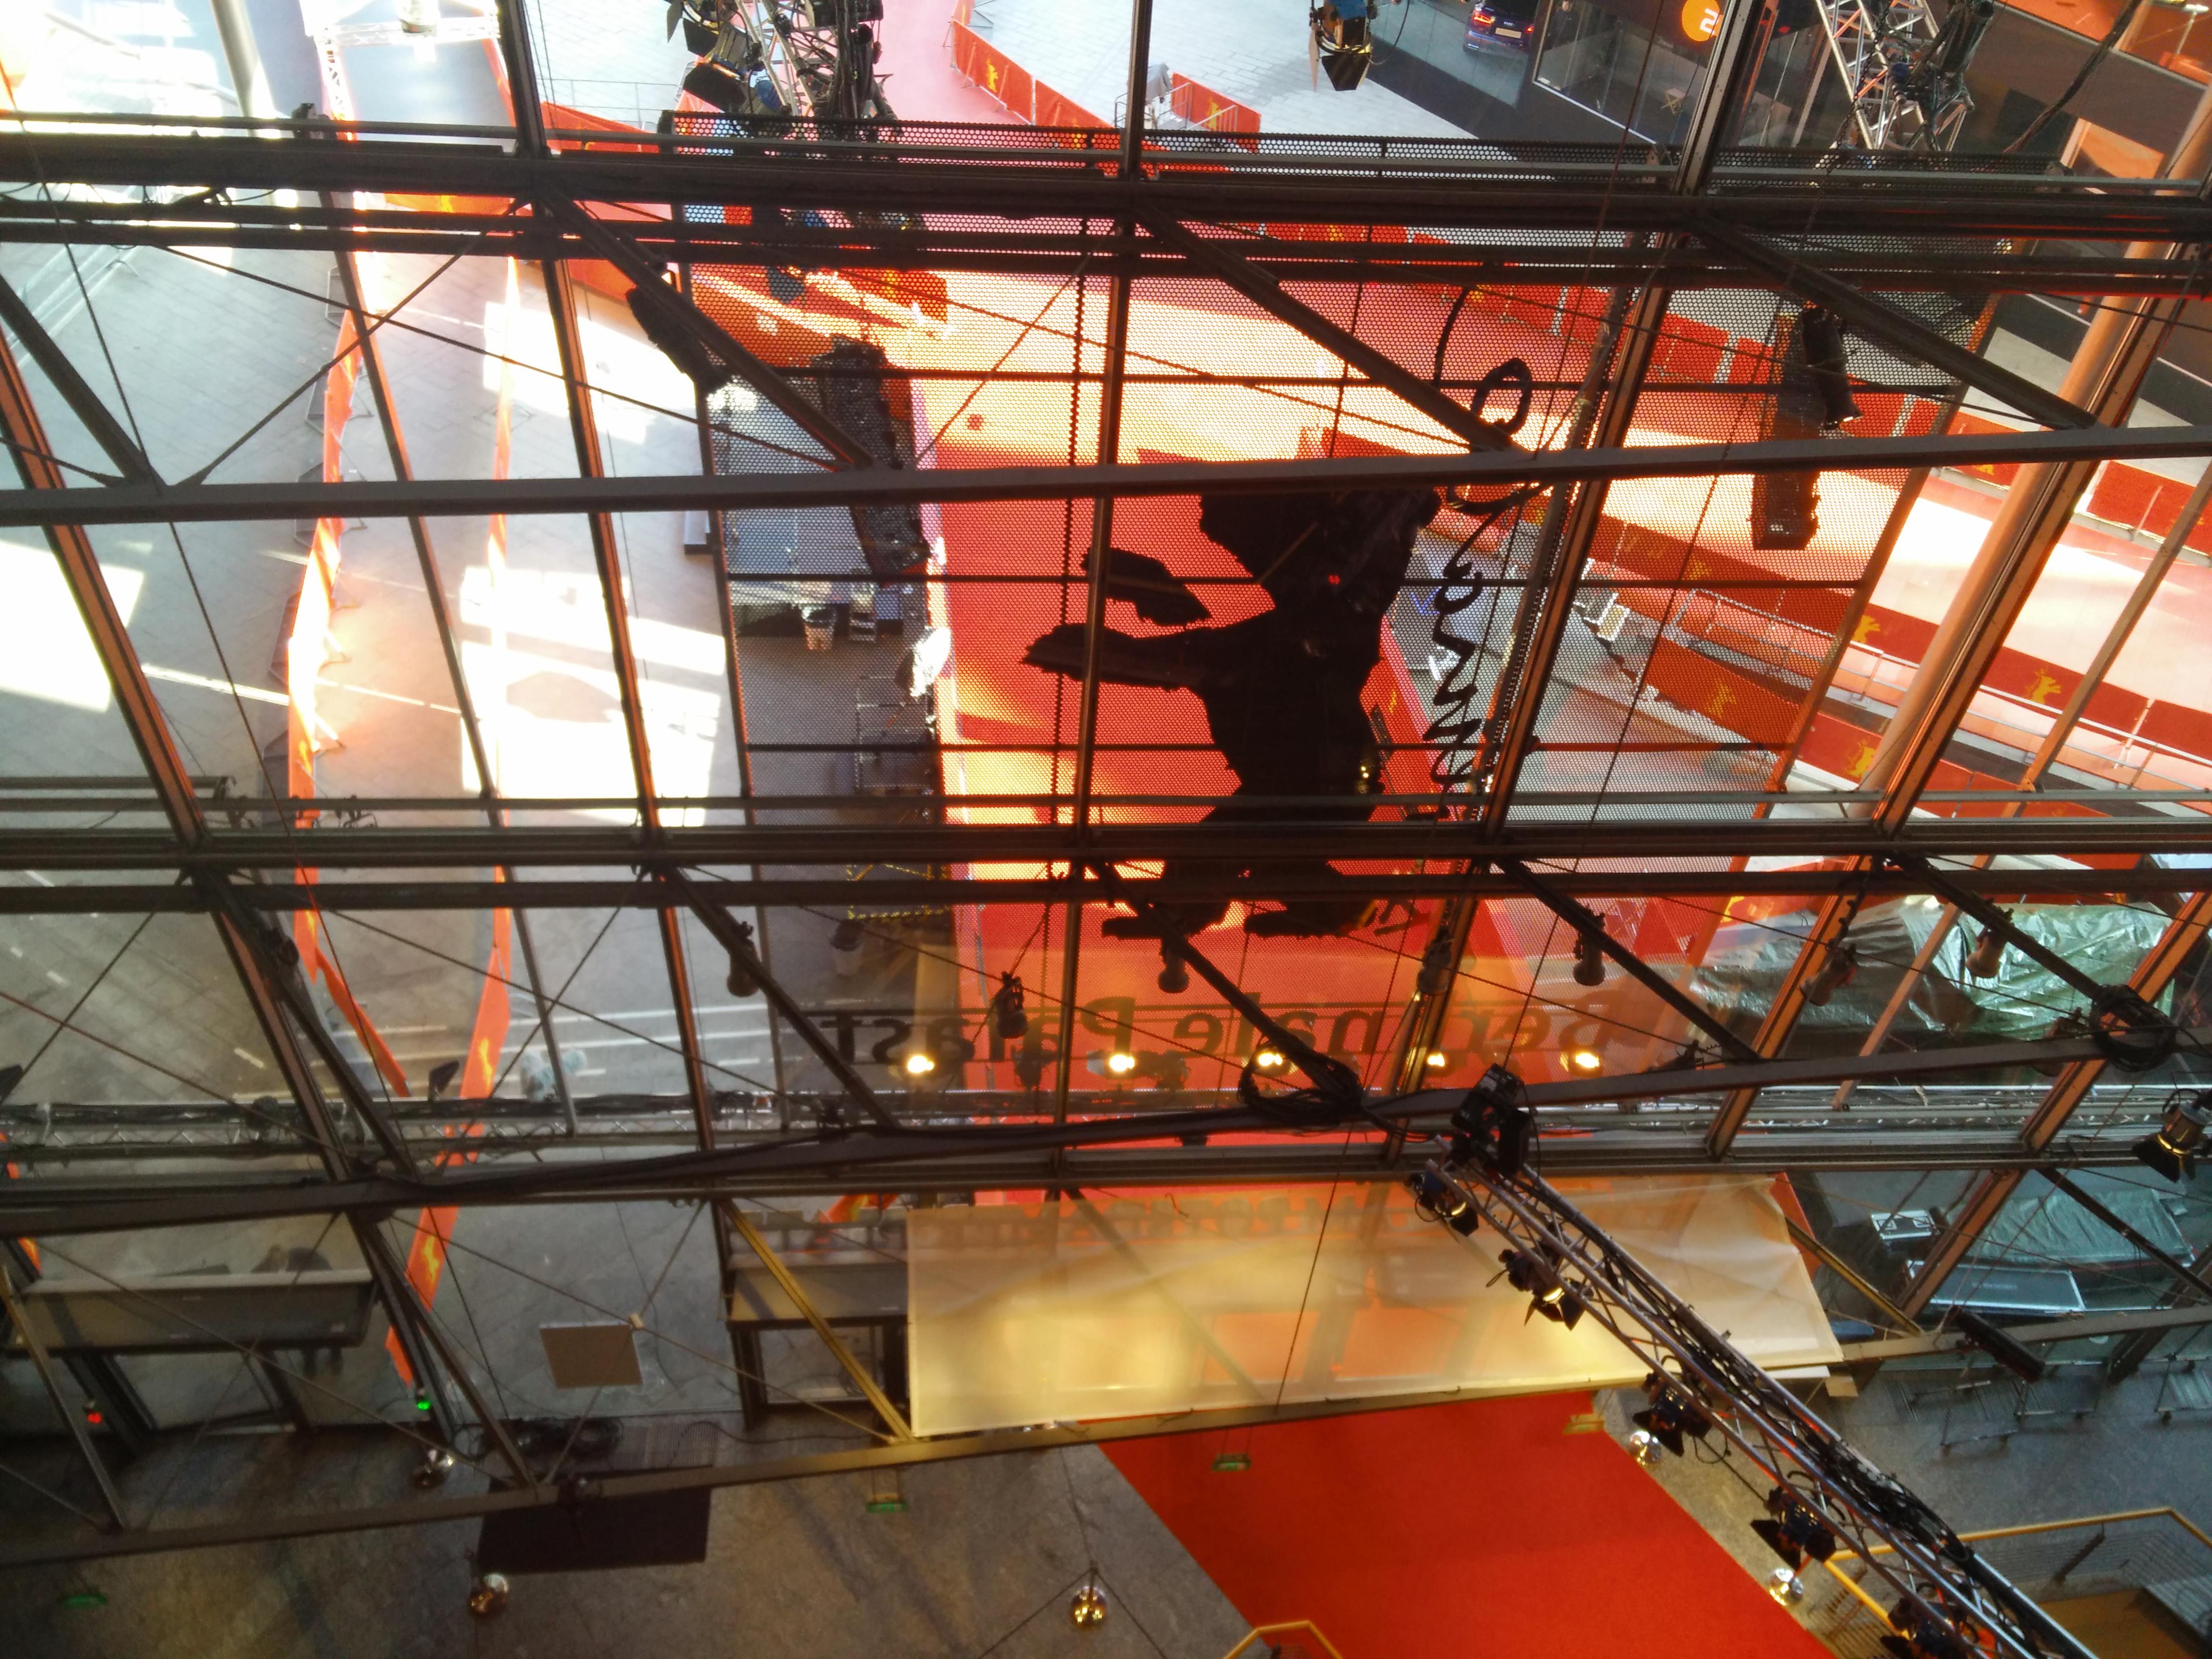 Berlinale Palast. Copyright: Kulturschoxx/Susanne Gietl